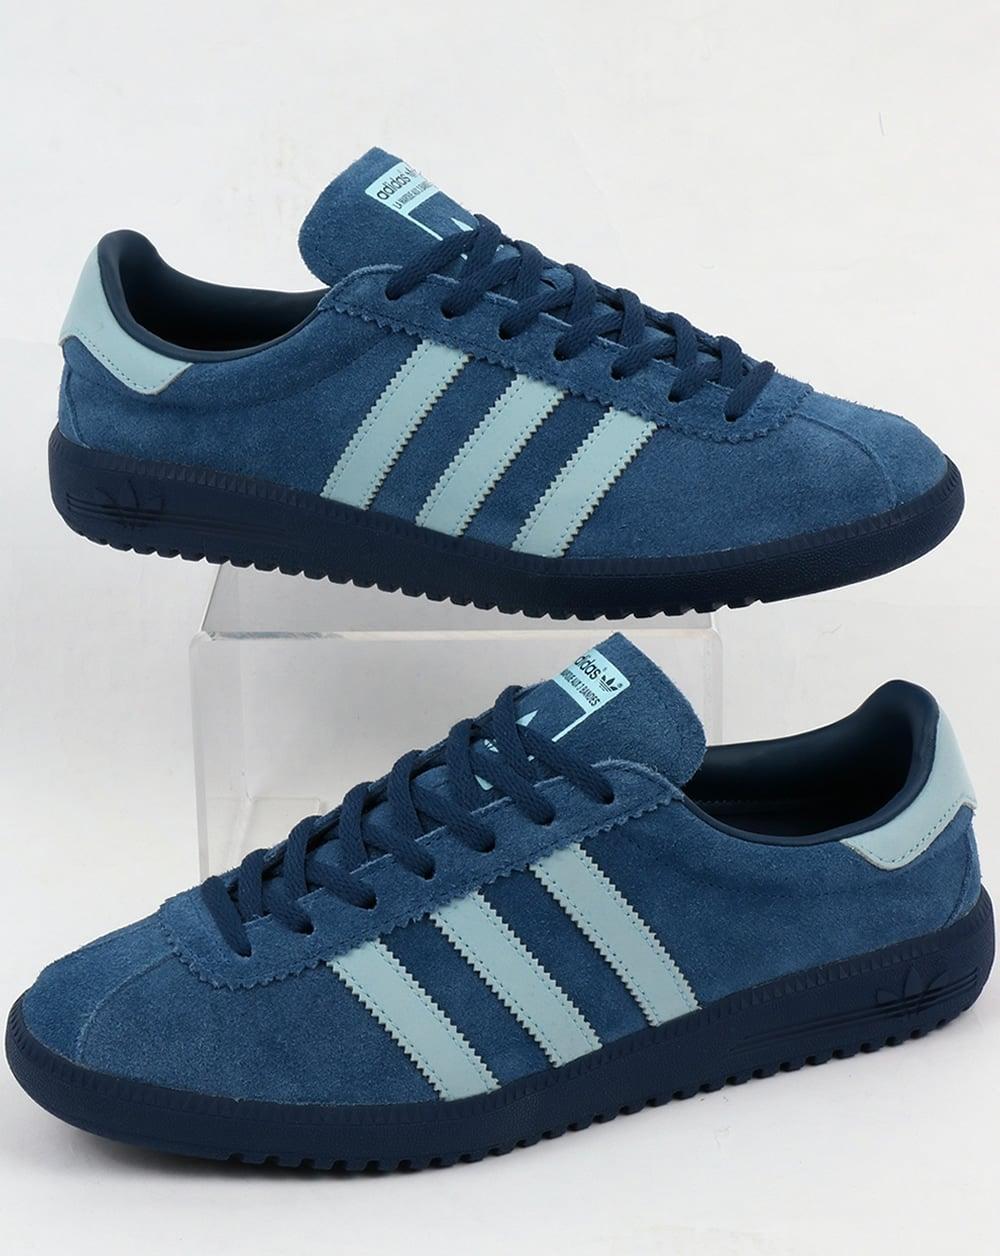 Adidas Bermuda Trainers Navy, Blue, Mystery, Clear originals